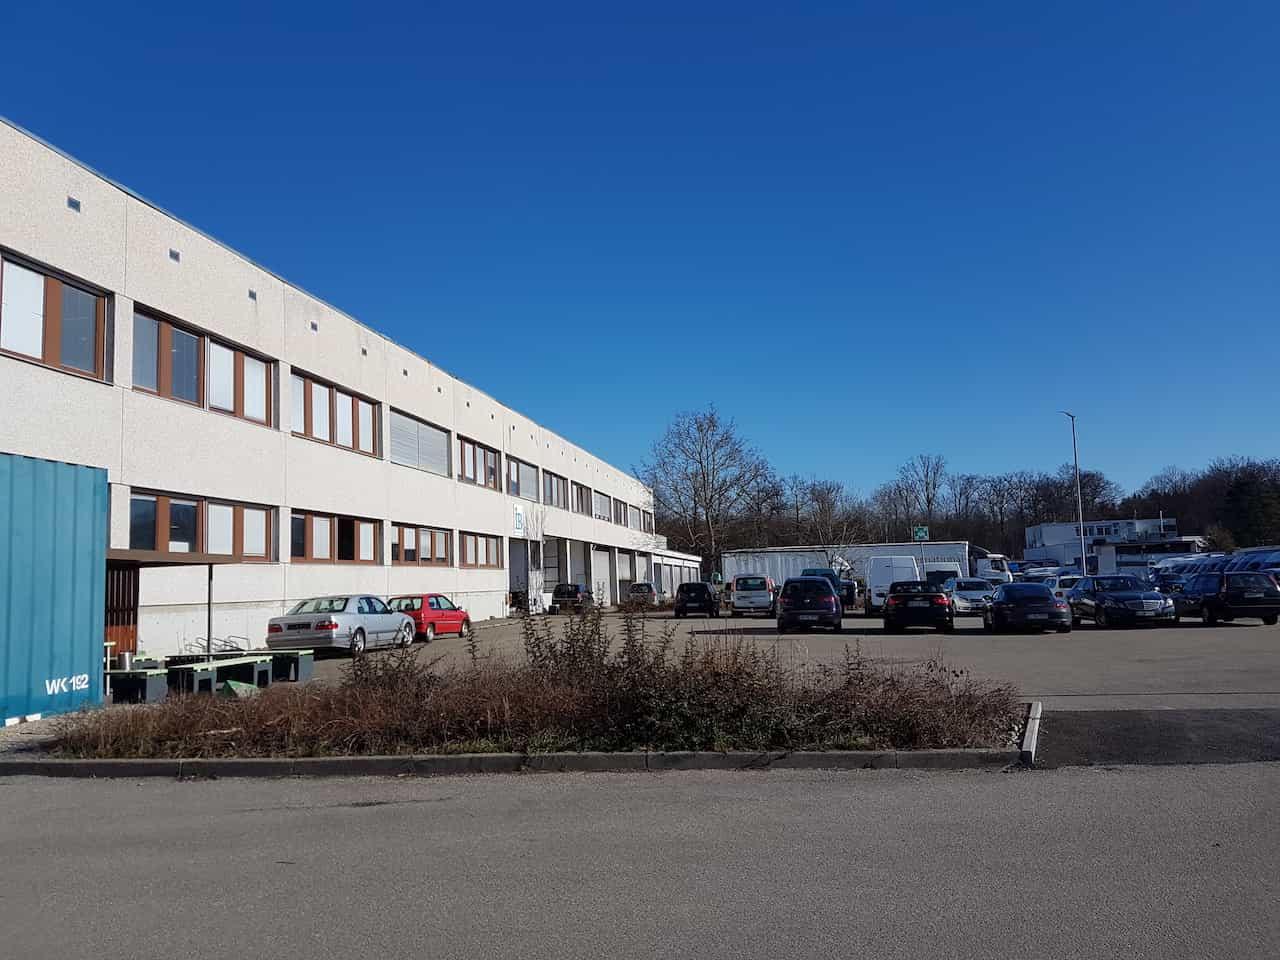 Logistikhalle-Ehningen-02